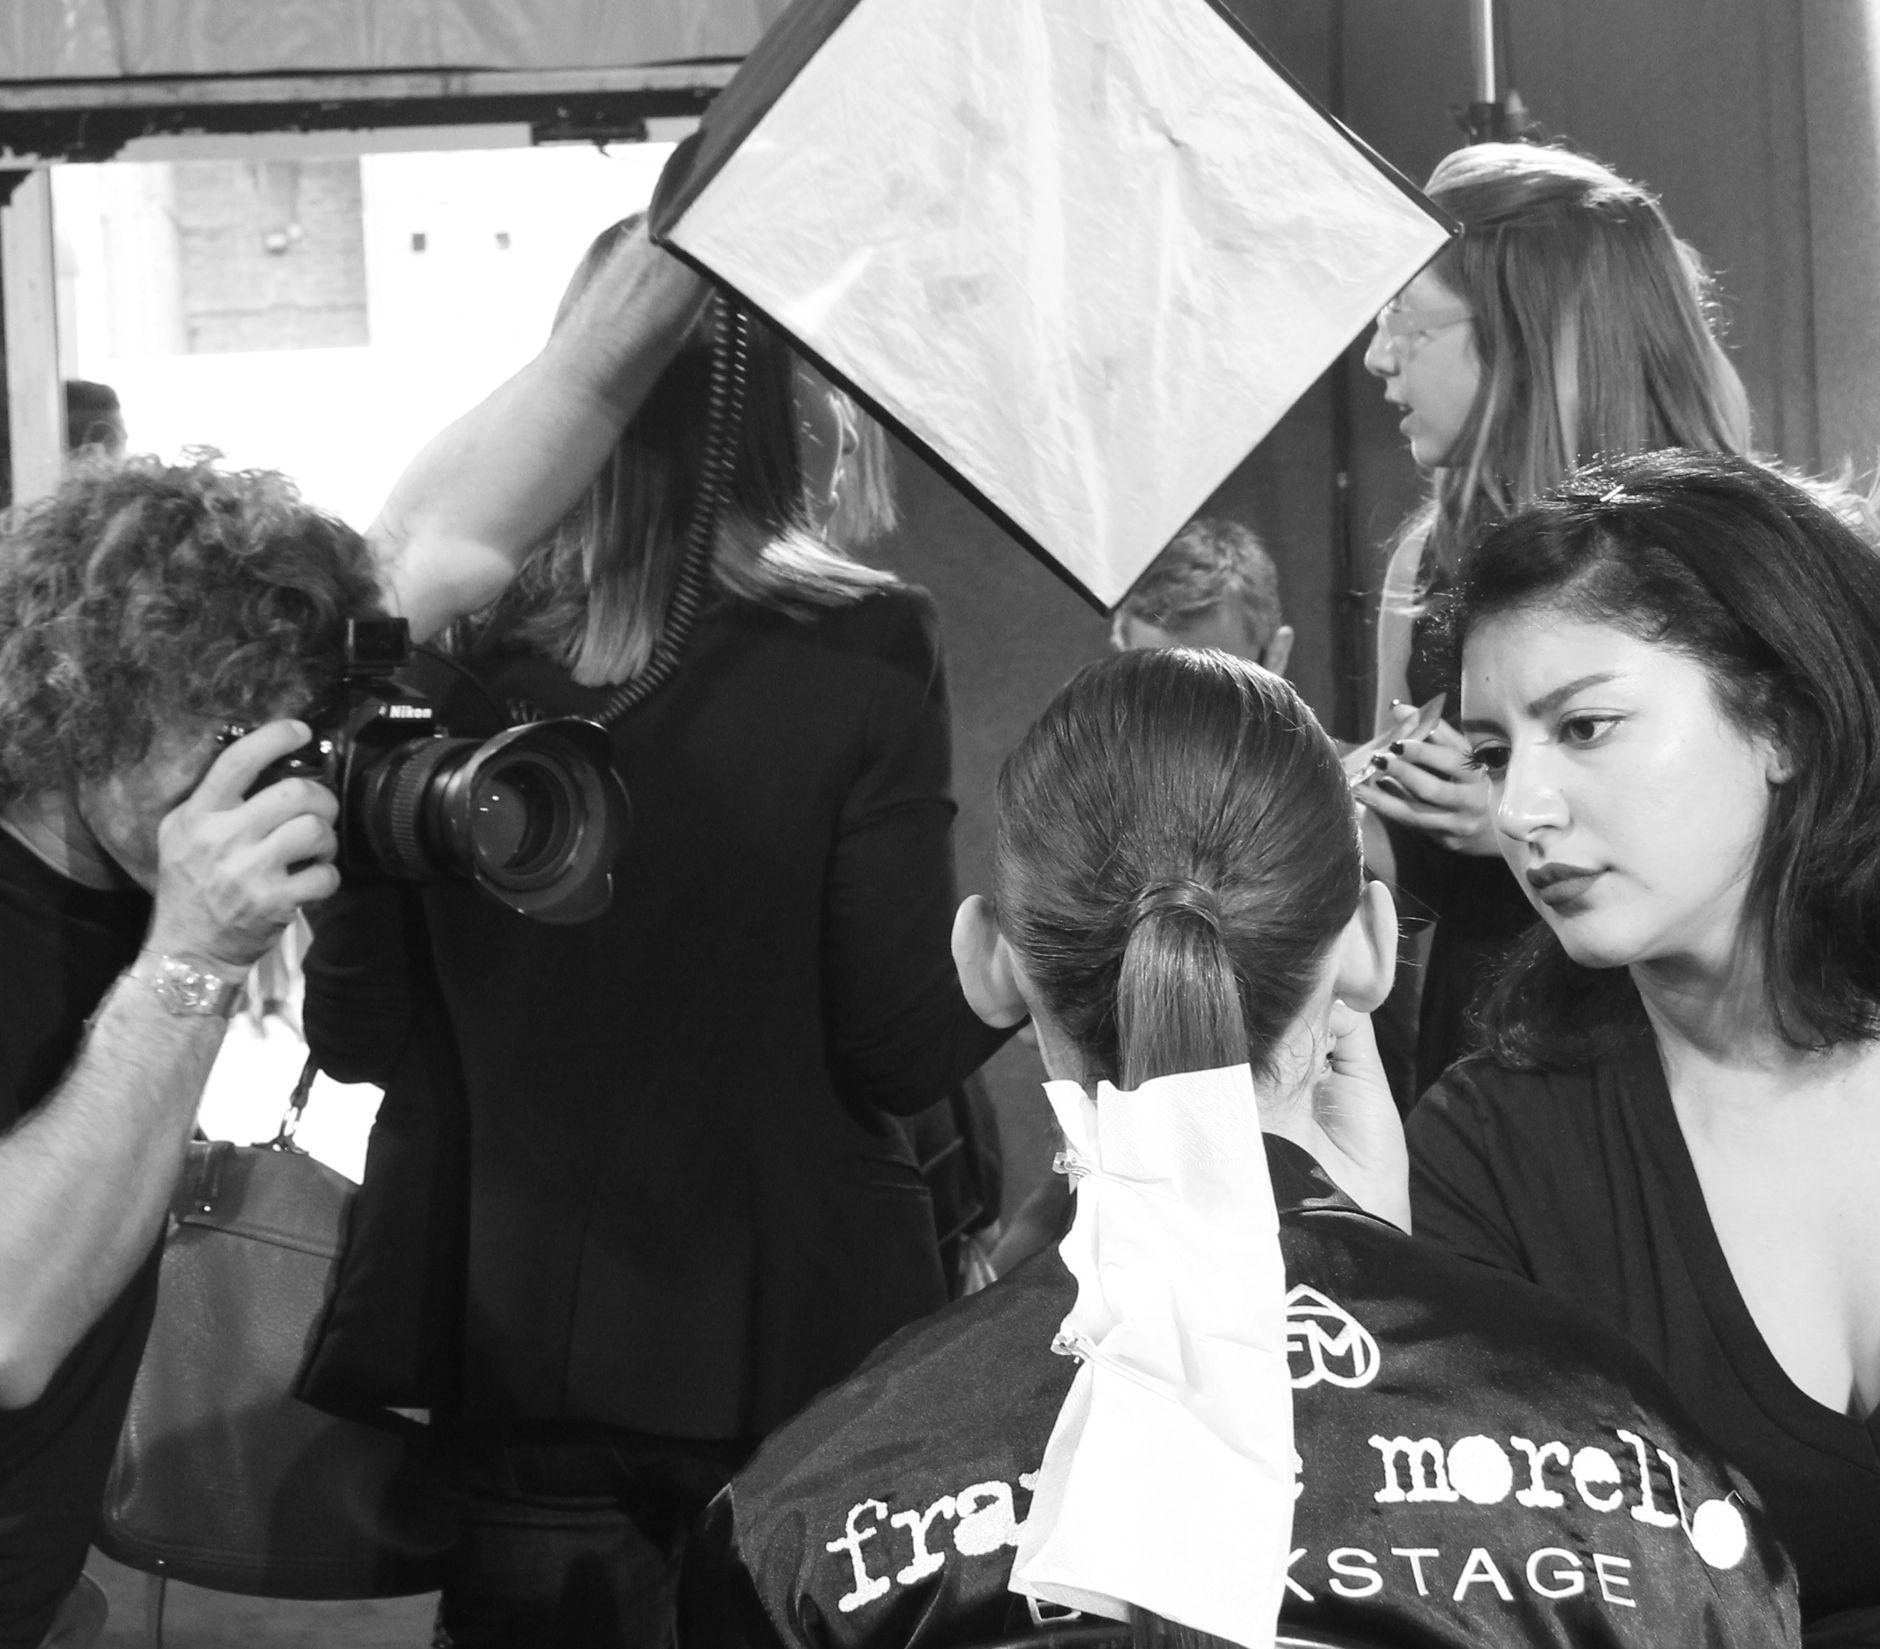 Backstage Fashion Woman